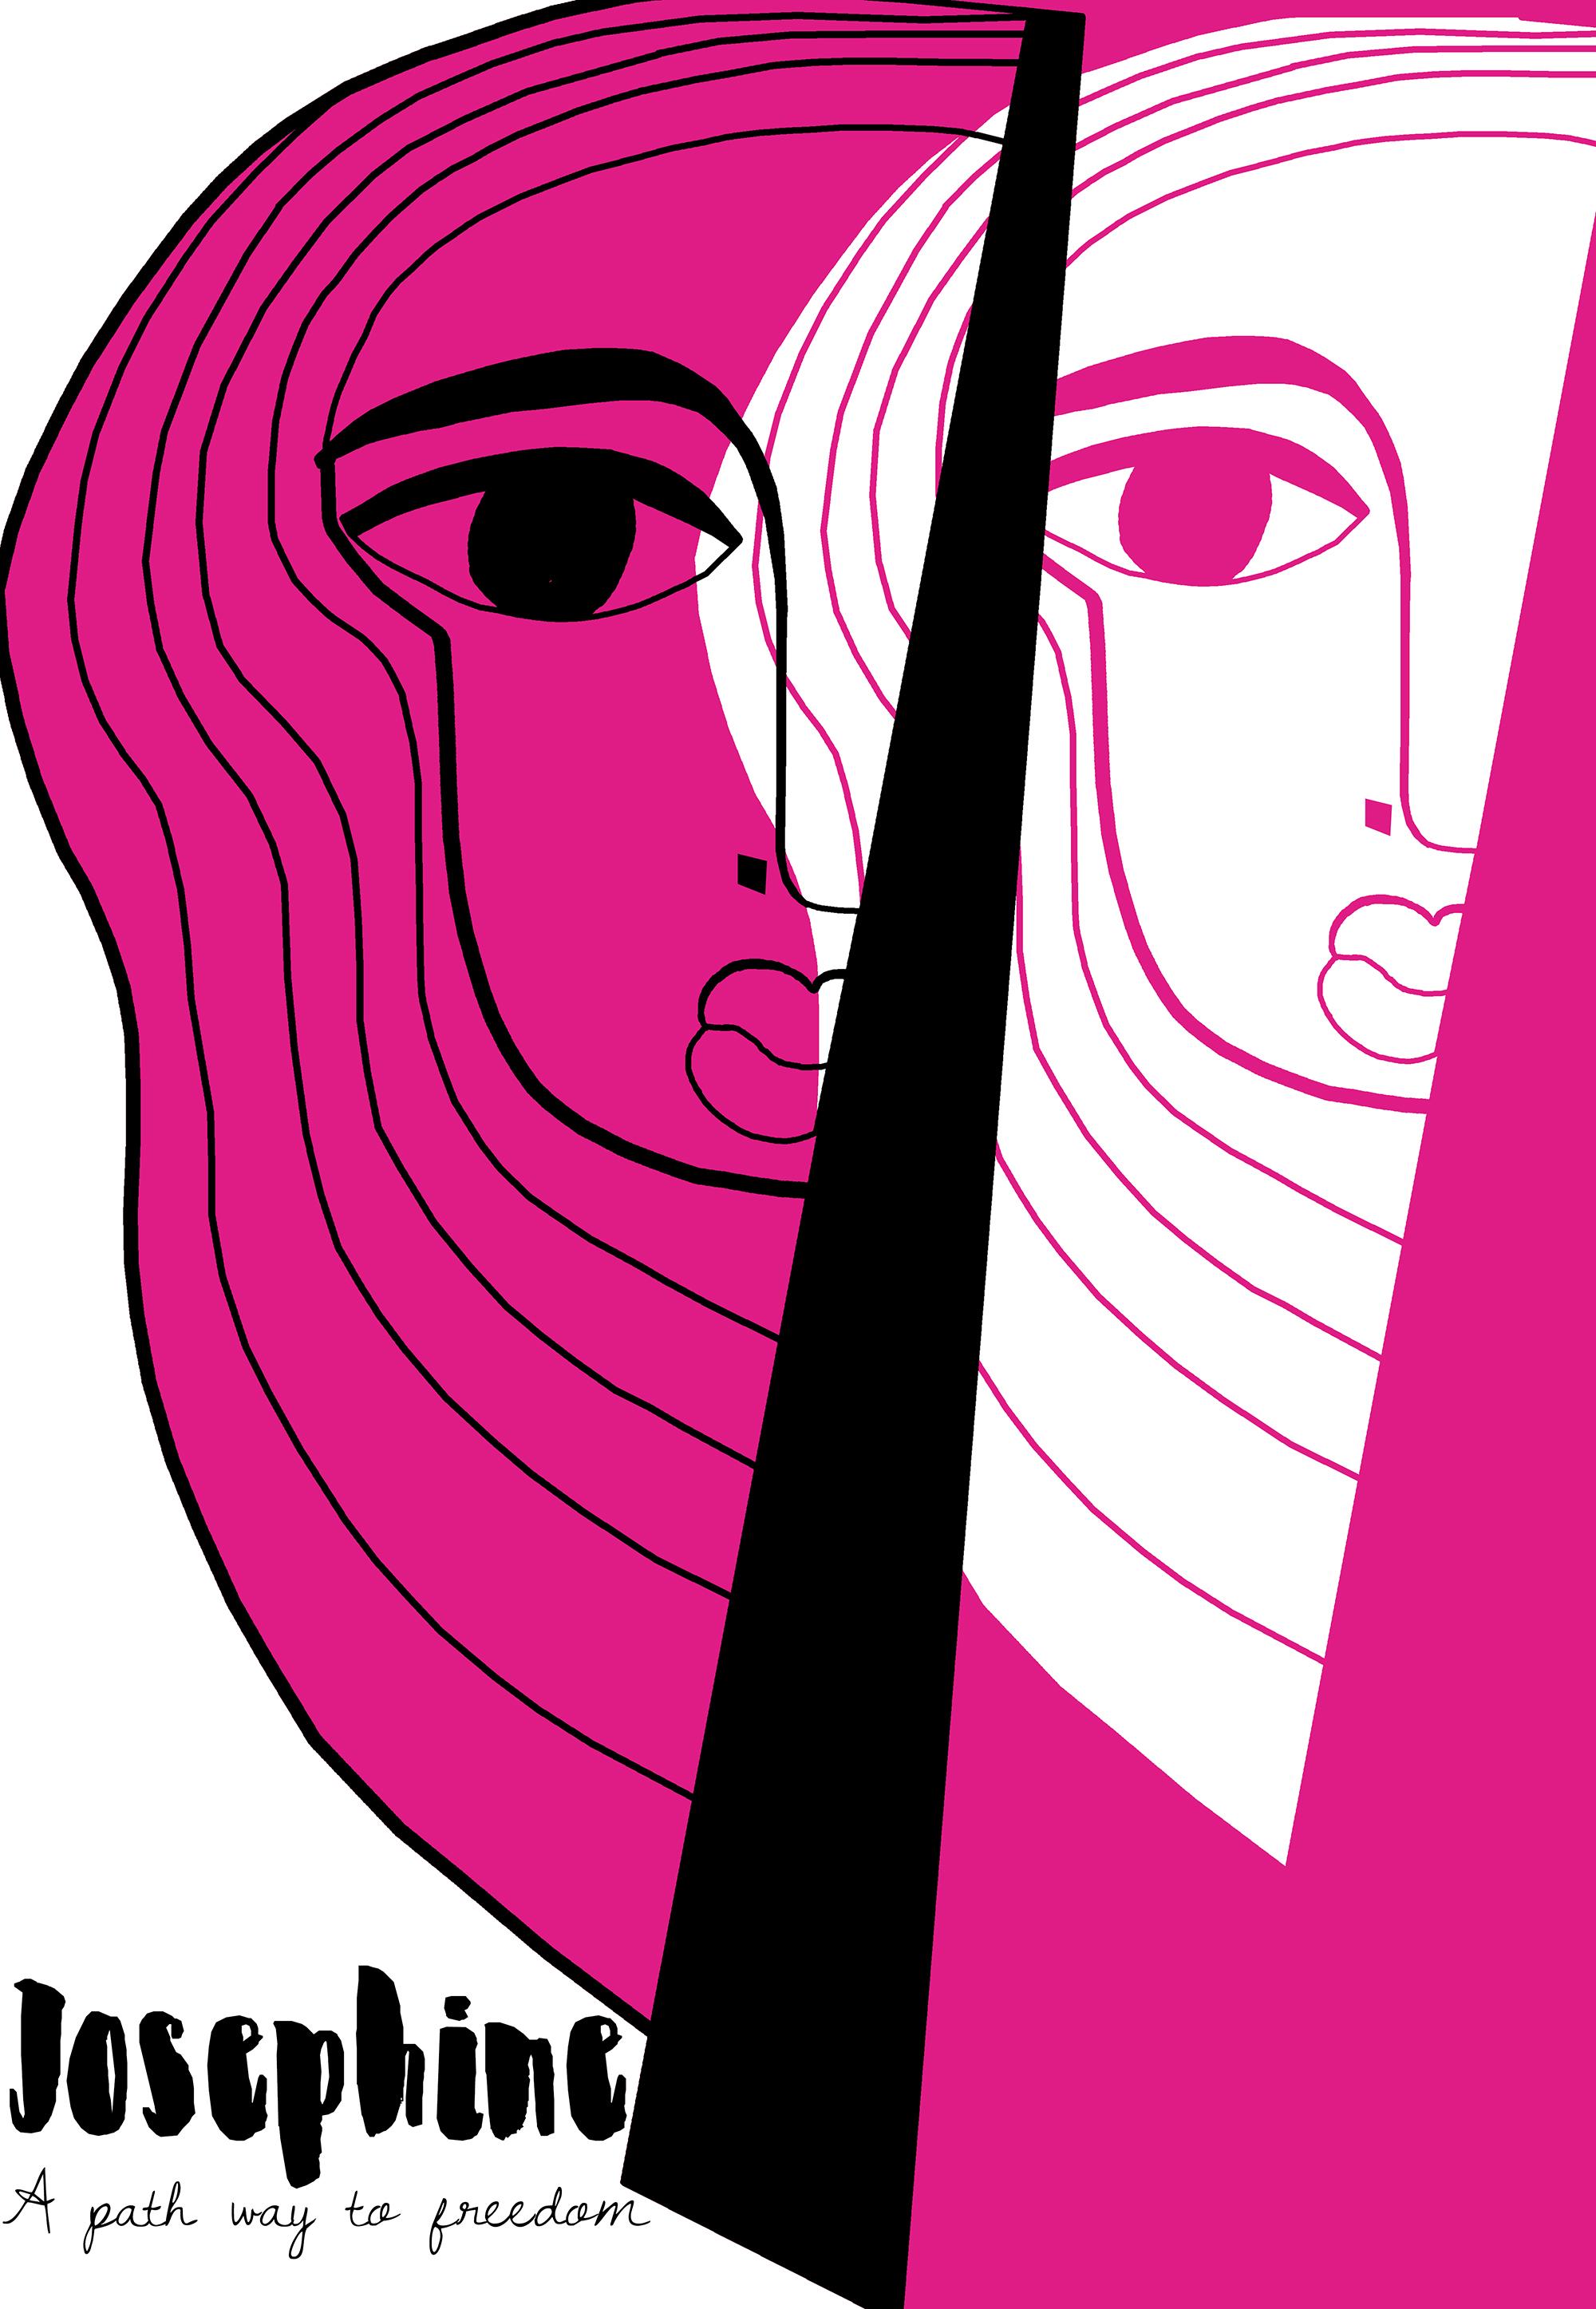 Book Cover_Josephine by Virginia Elena Patrone